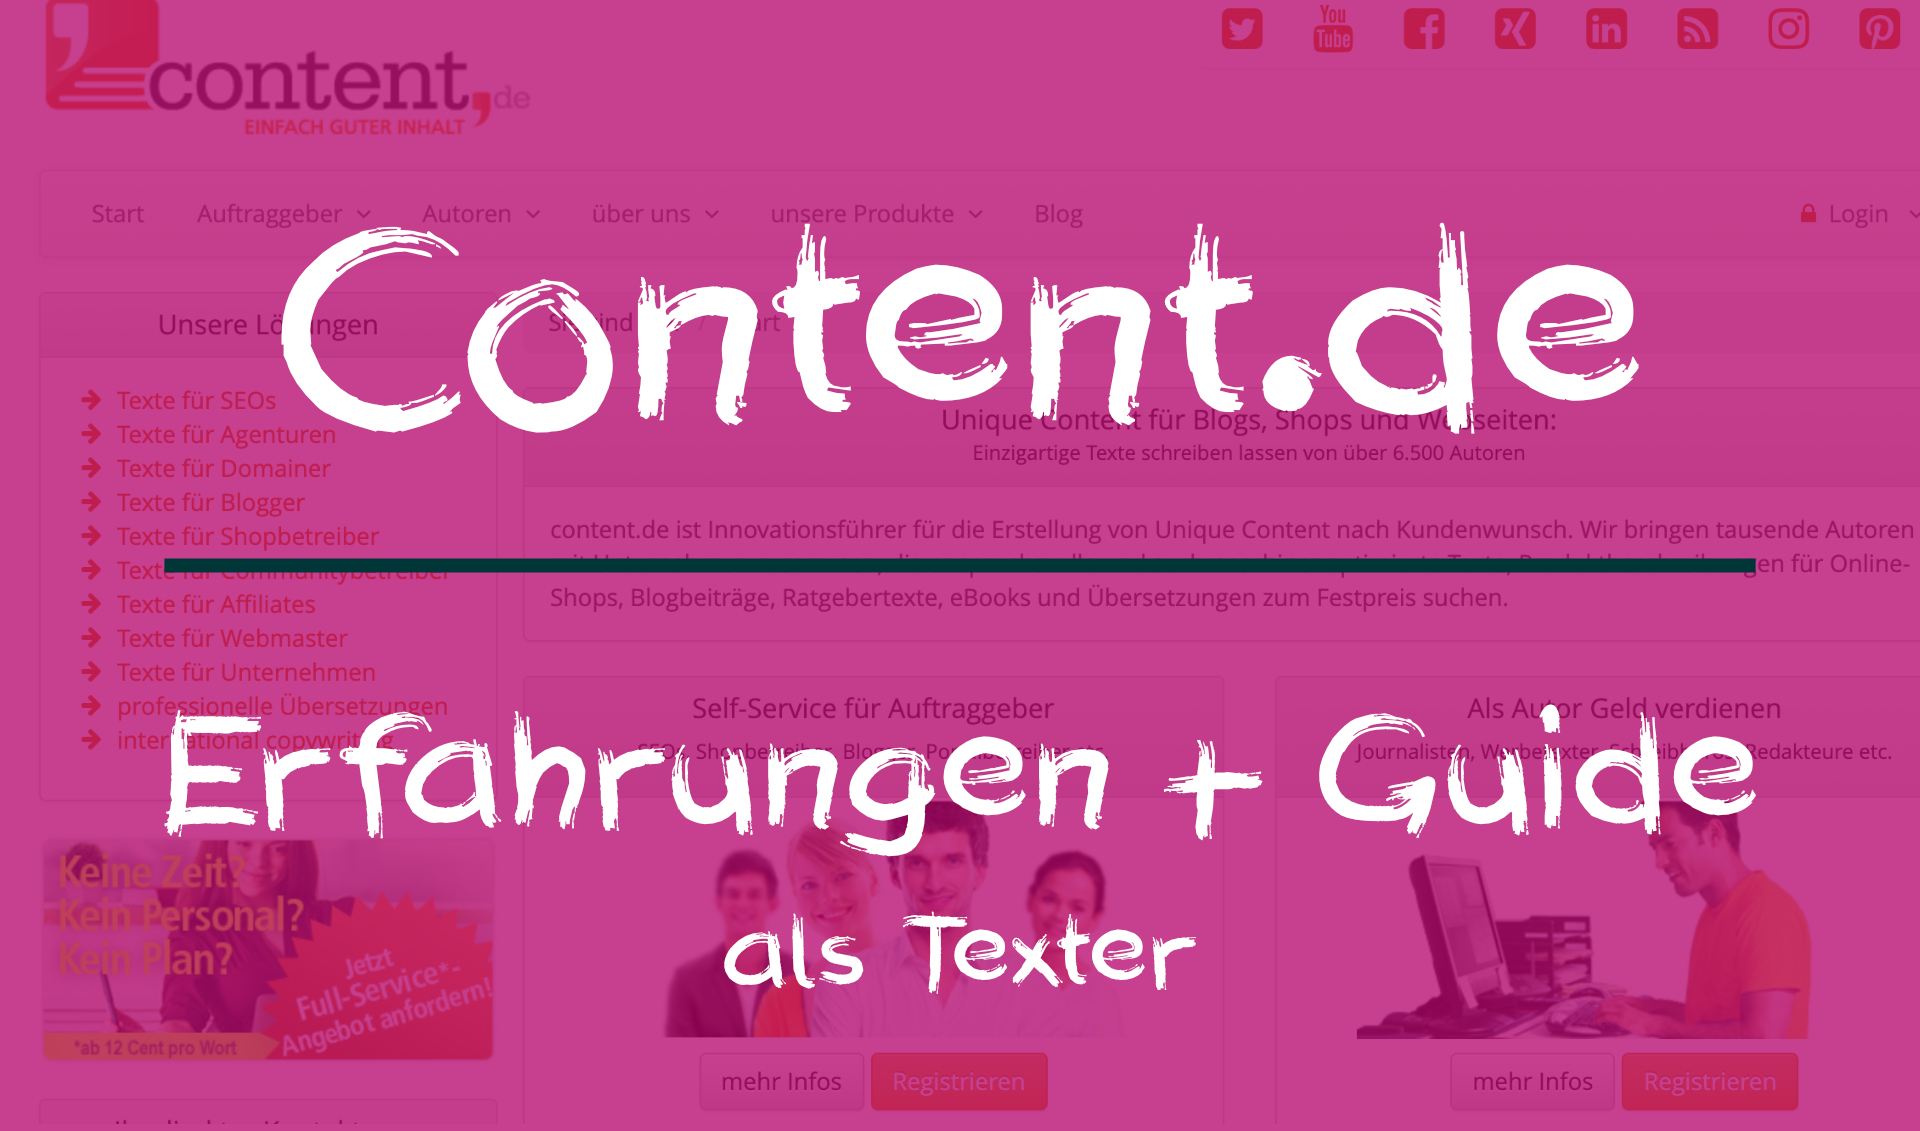 Erfahrungen mit Content.de (als Texter) + Guide